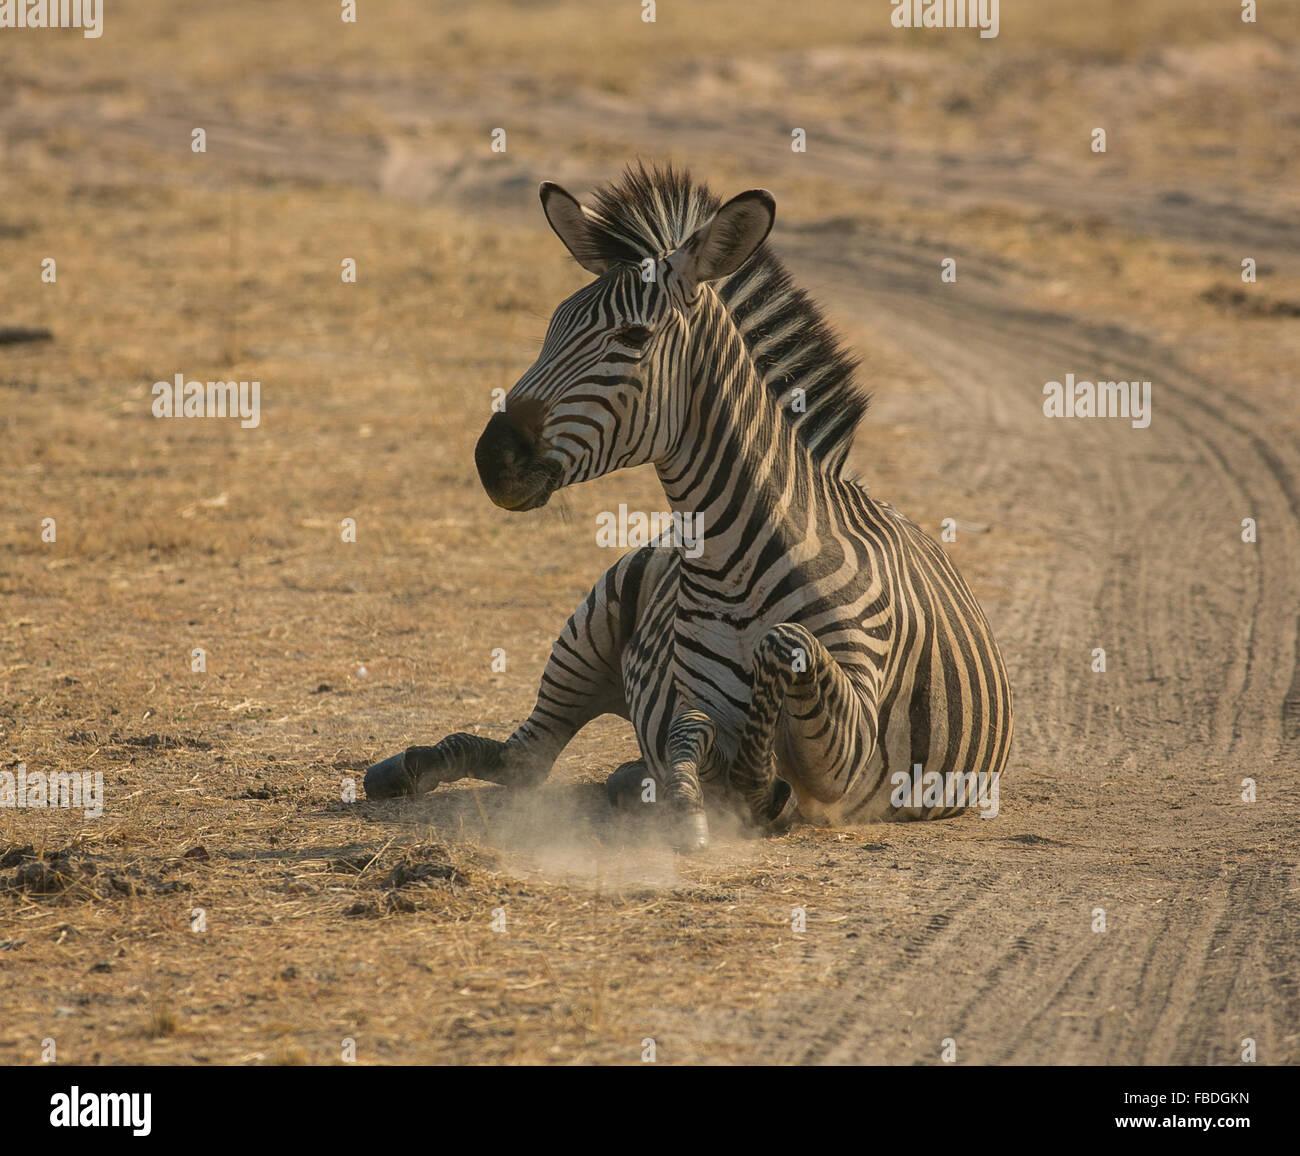 Un zèbre de Crawshay (Equus quagga crawshayi) apprendre à ses pieds, l'Laungwa, Zambie, Afrique Banque D'Images